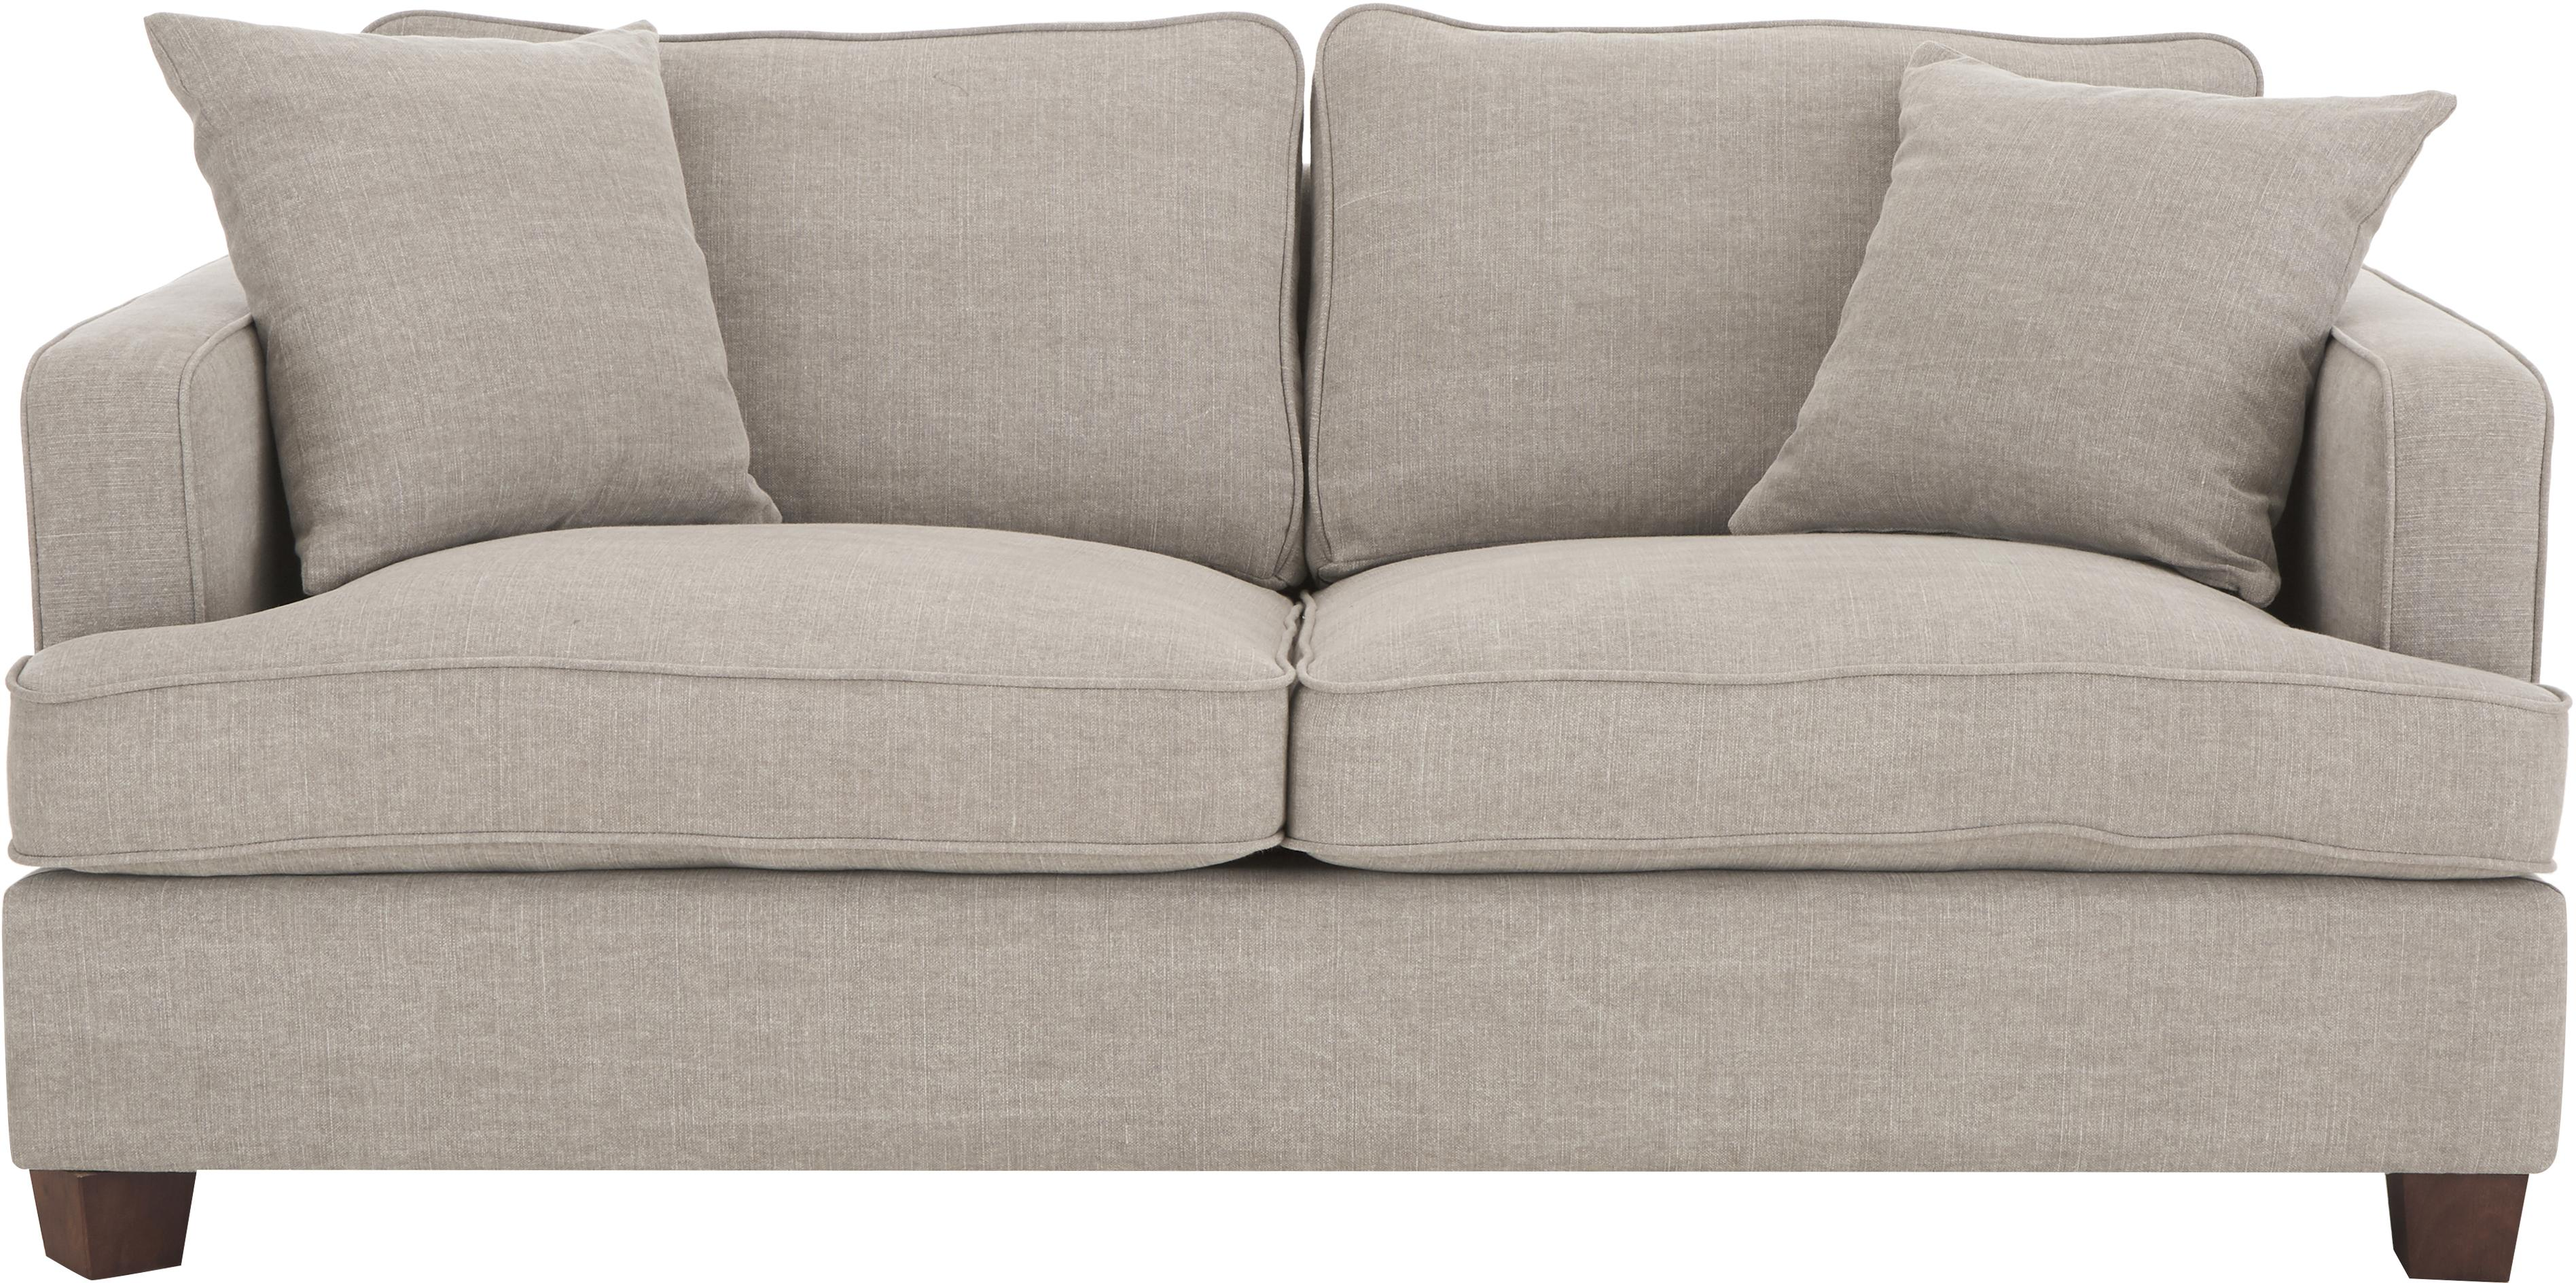 Big Sofa Warren (2-Sitzer), Gestell: Holz, Bezug: 60% Baumwolle, 40% Leinen, Füße: Schwarzholz, Webstoff Sandgrau, 178 x 85 cm